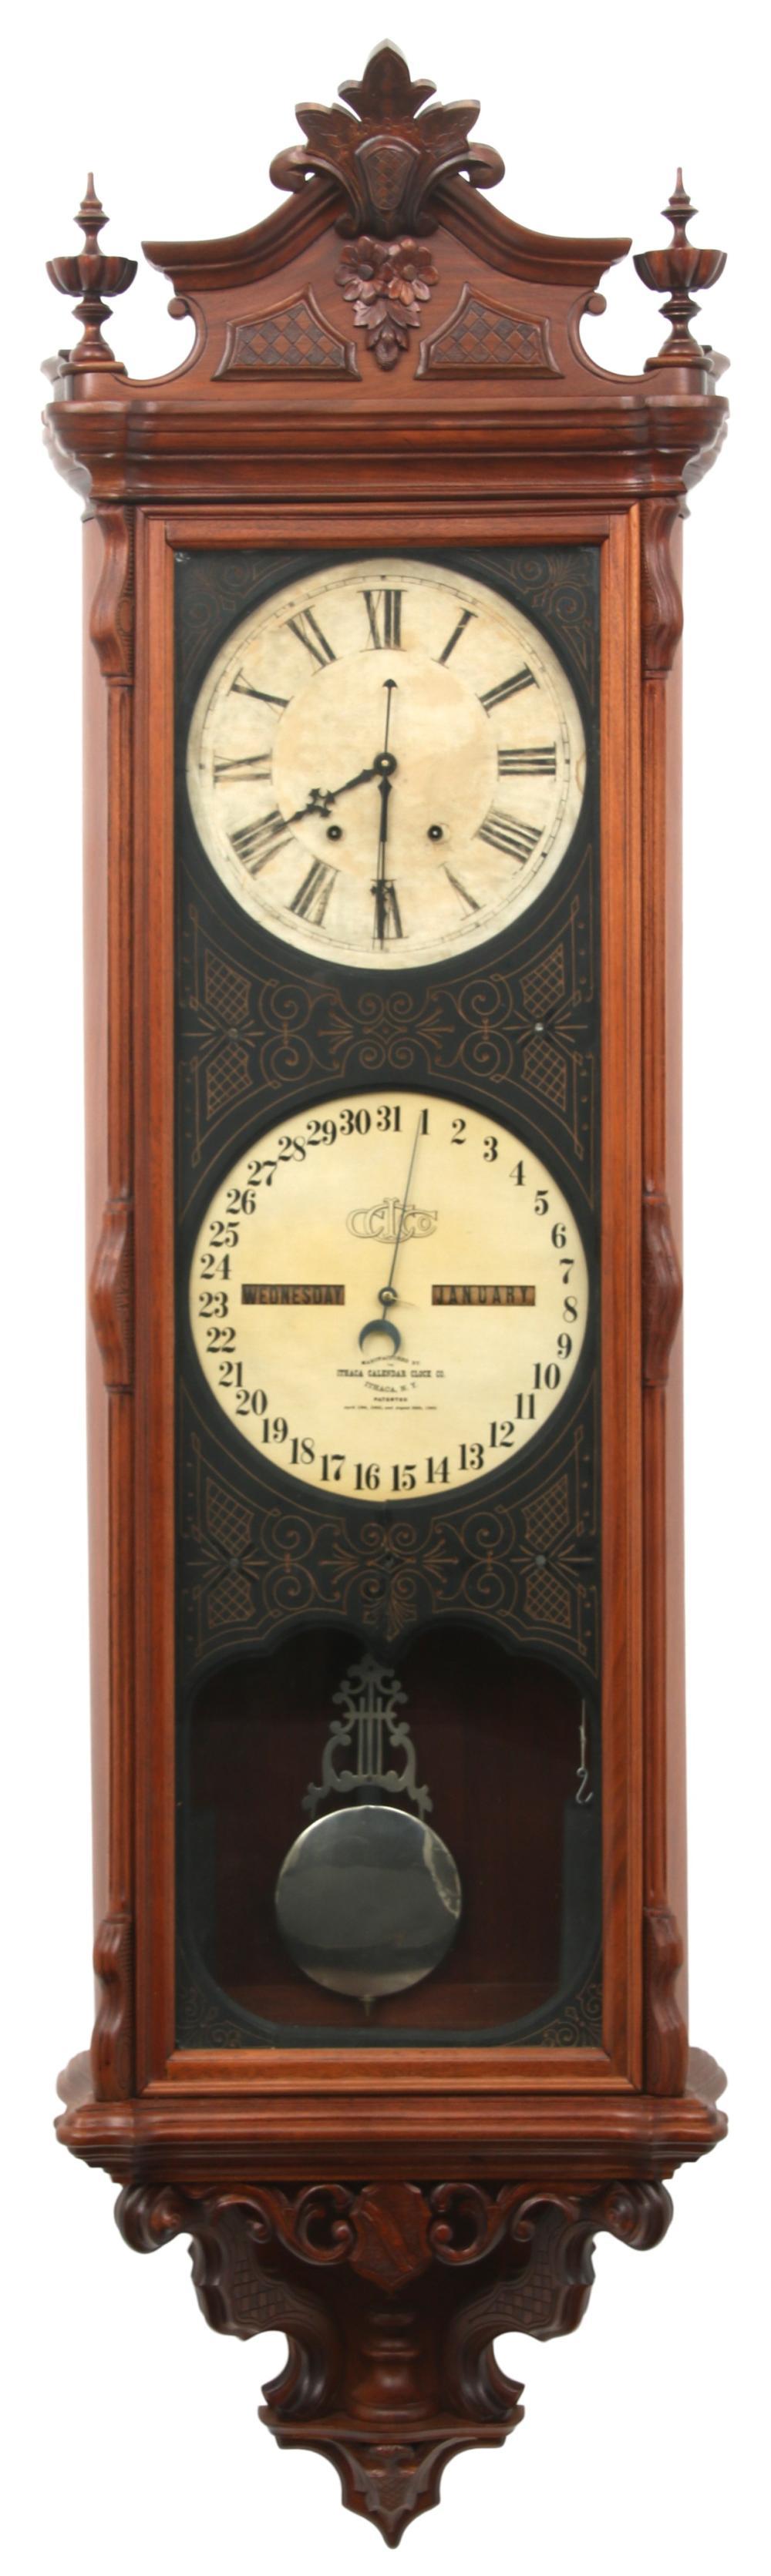 Ithaca Regulator No. 1 Calendar Wall Clock